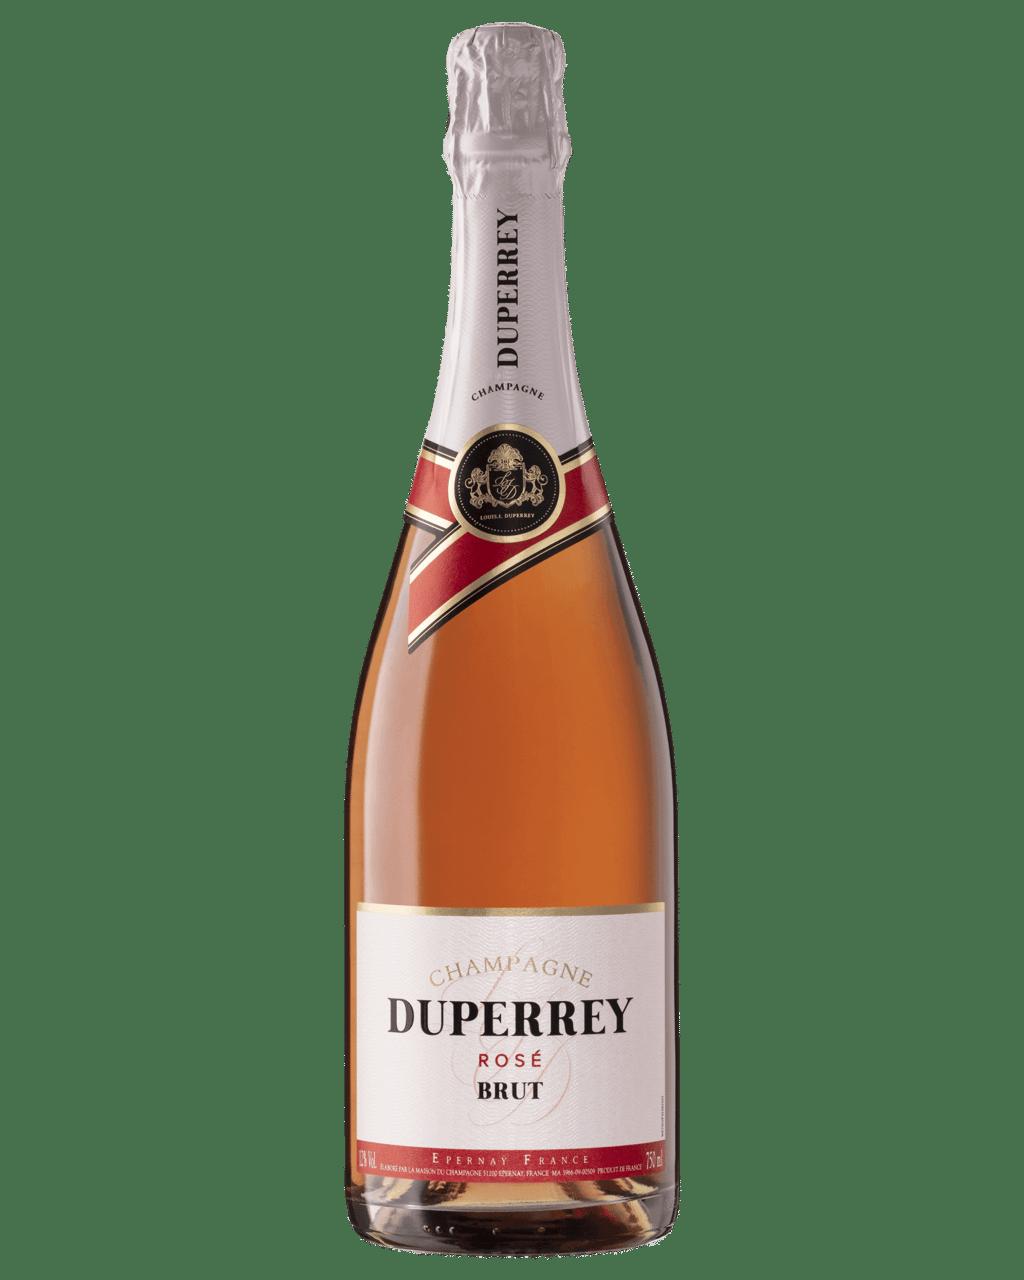 Malle Bar Maison Du Monde champagne duperrey brut rosé champagne nv | dan murphy's